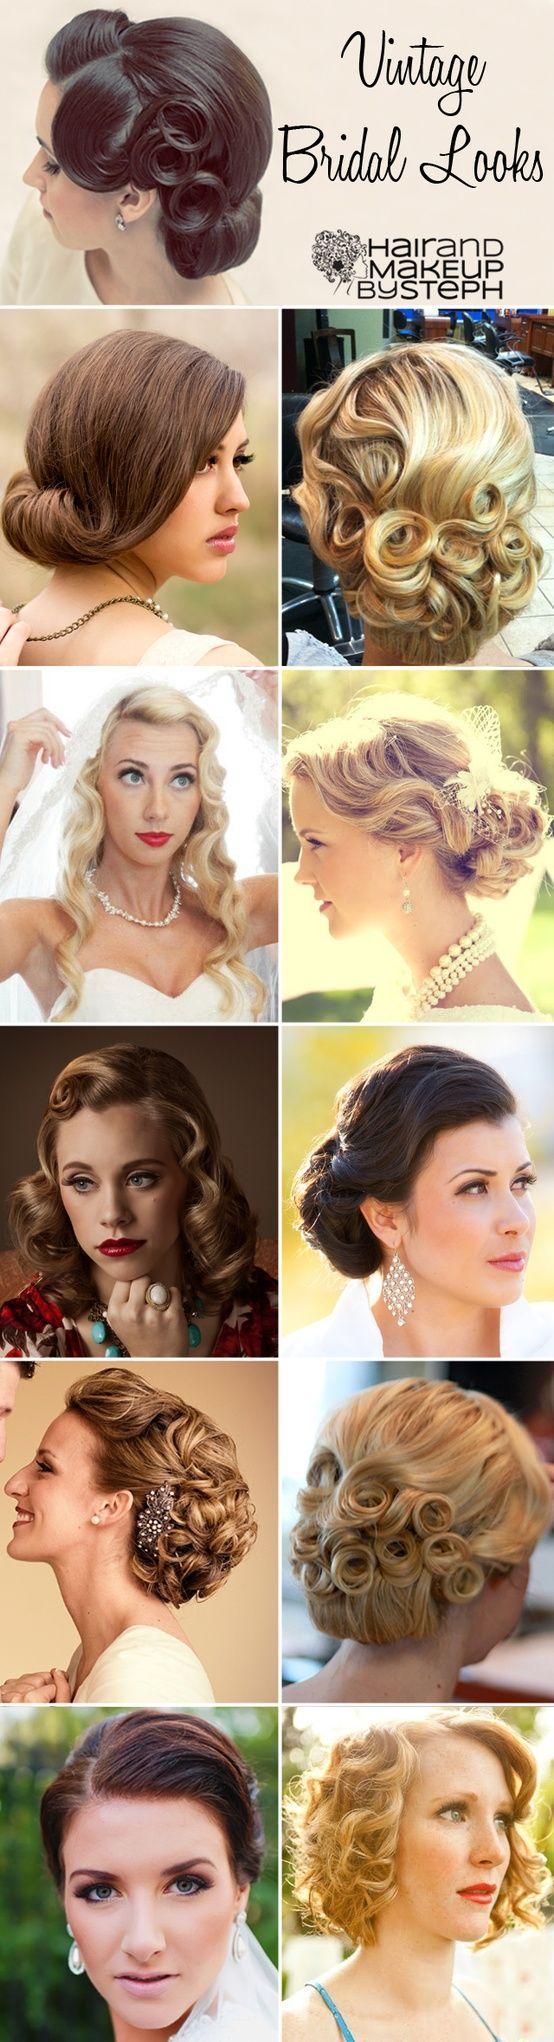 best earphones for music  Victoria KalaniJefferson on Beauty